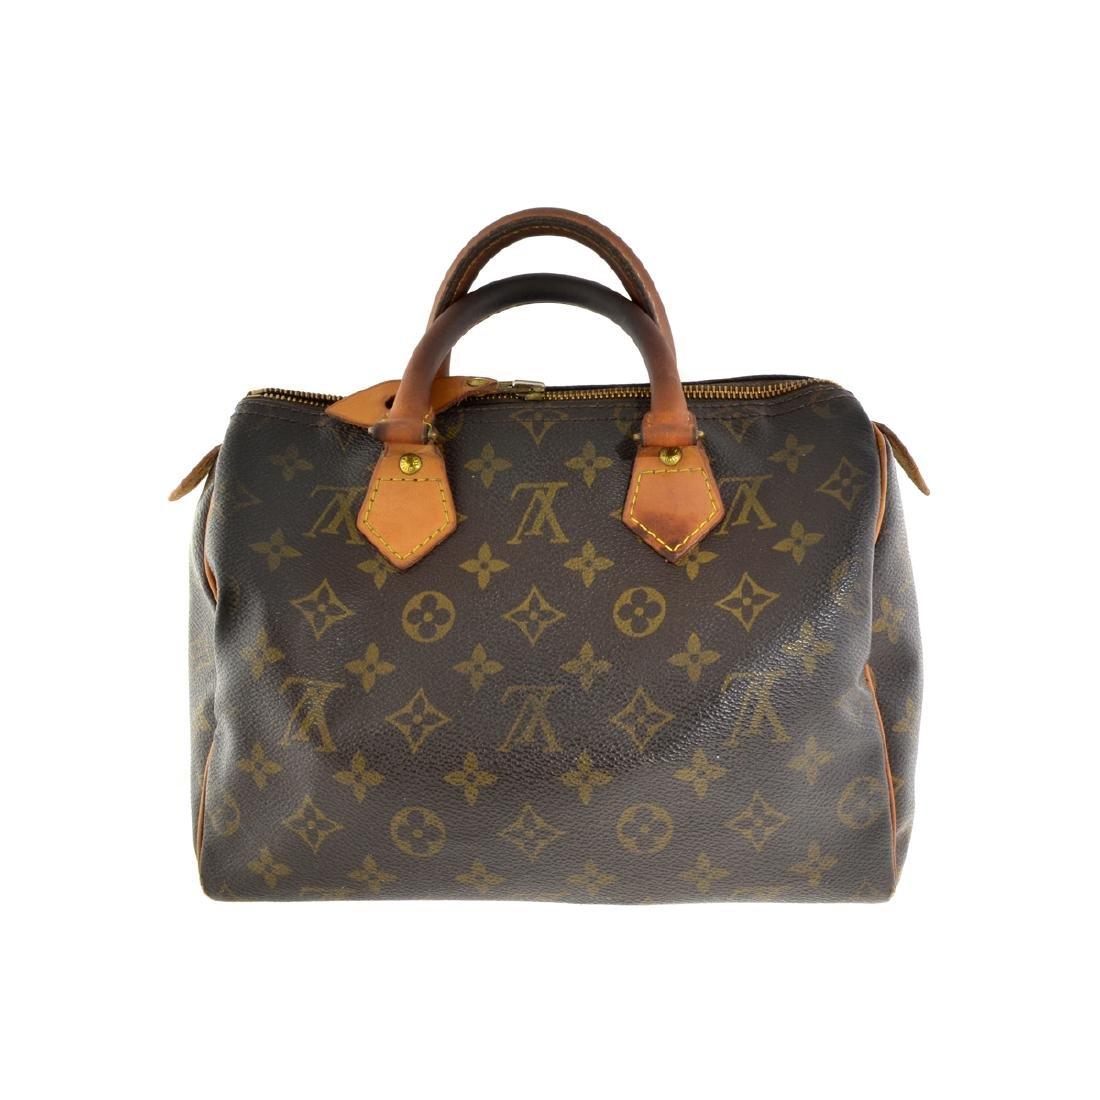 Rare Vintage Louis Vuitton Monogram Speedy 25 Purse